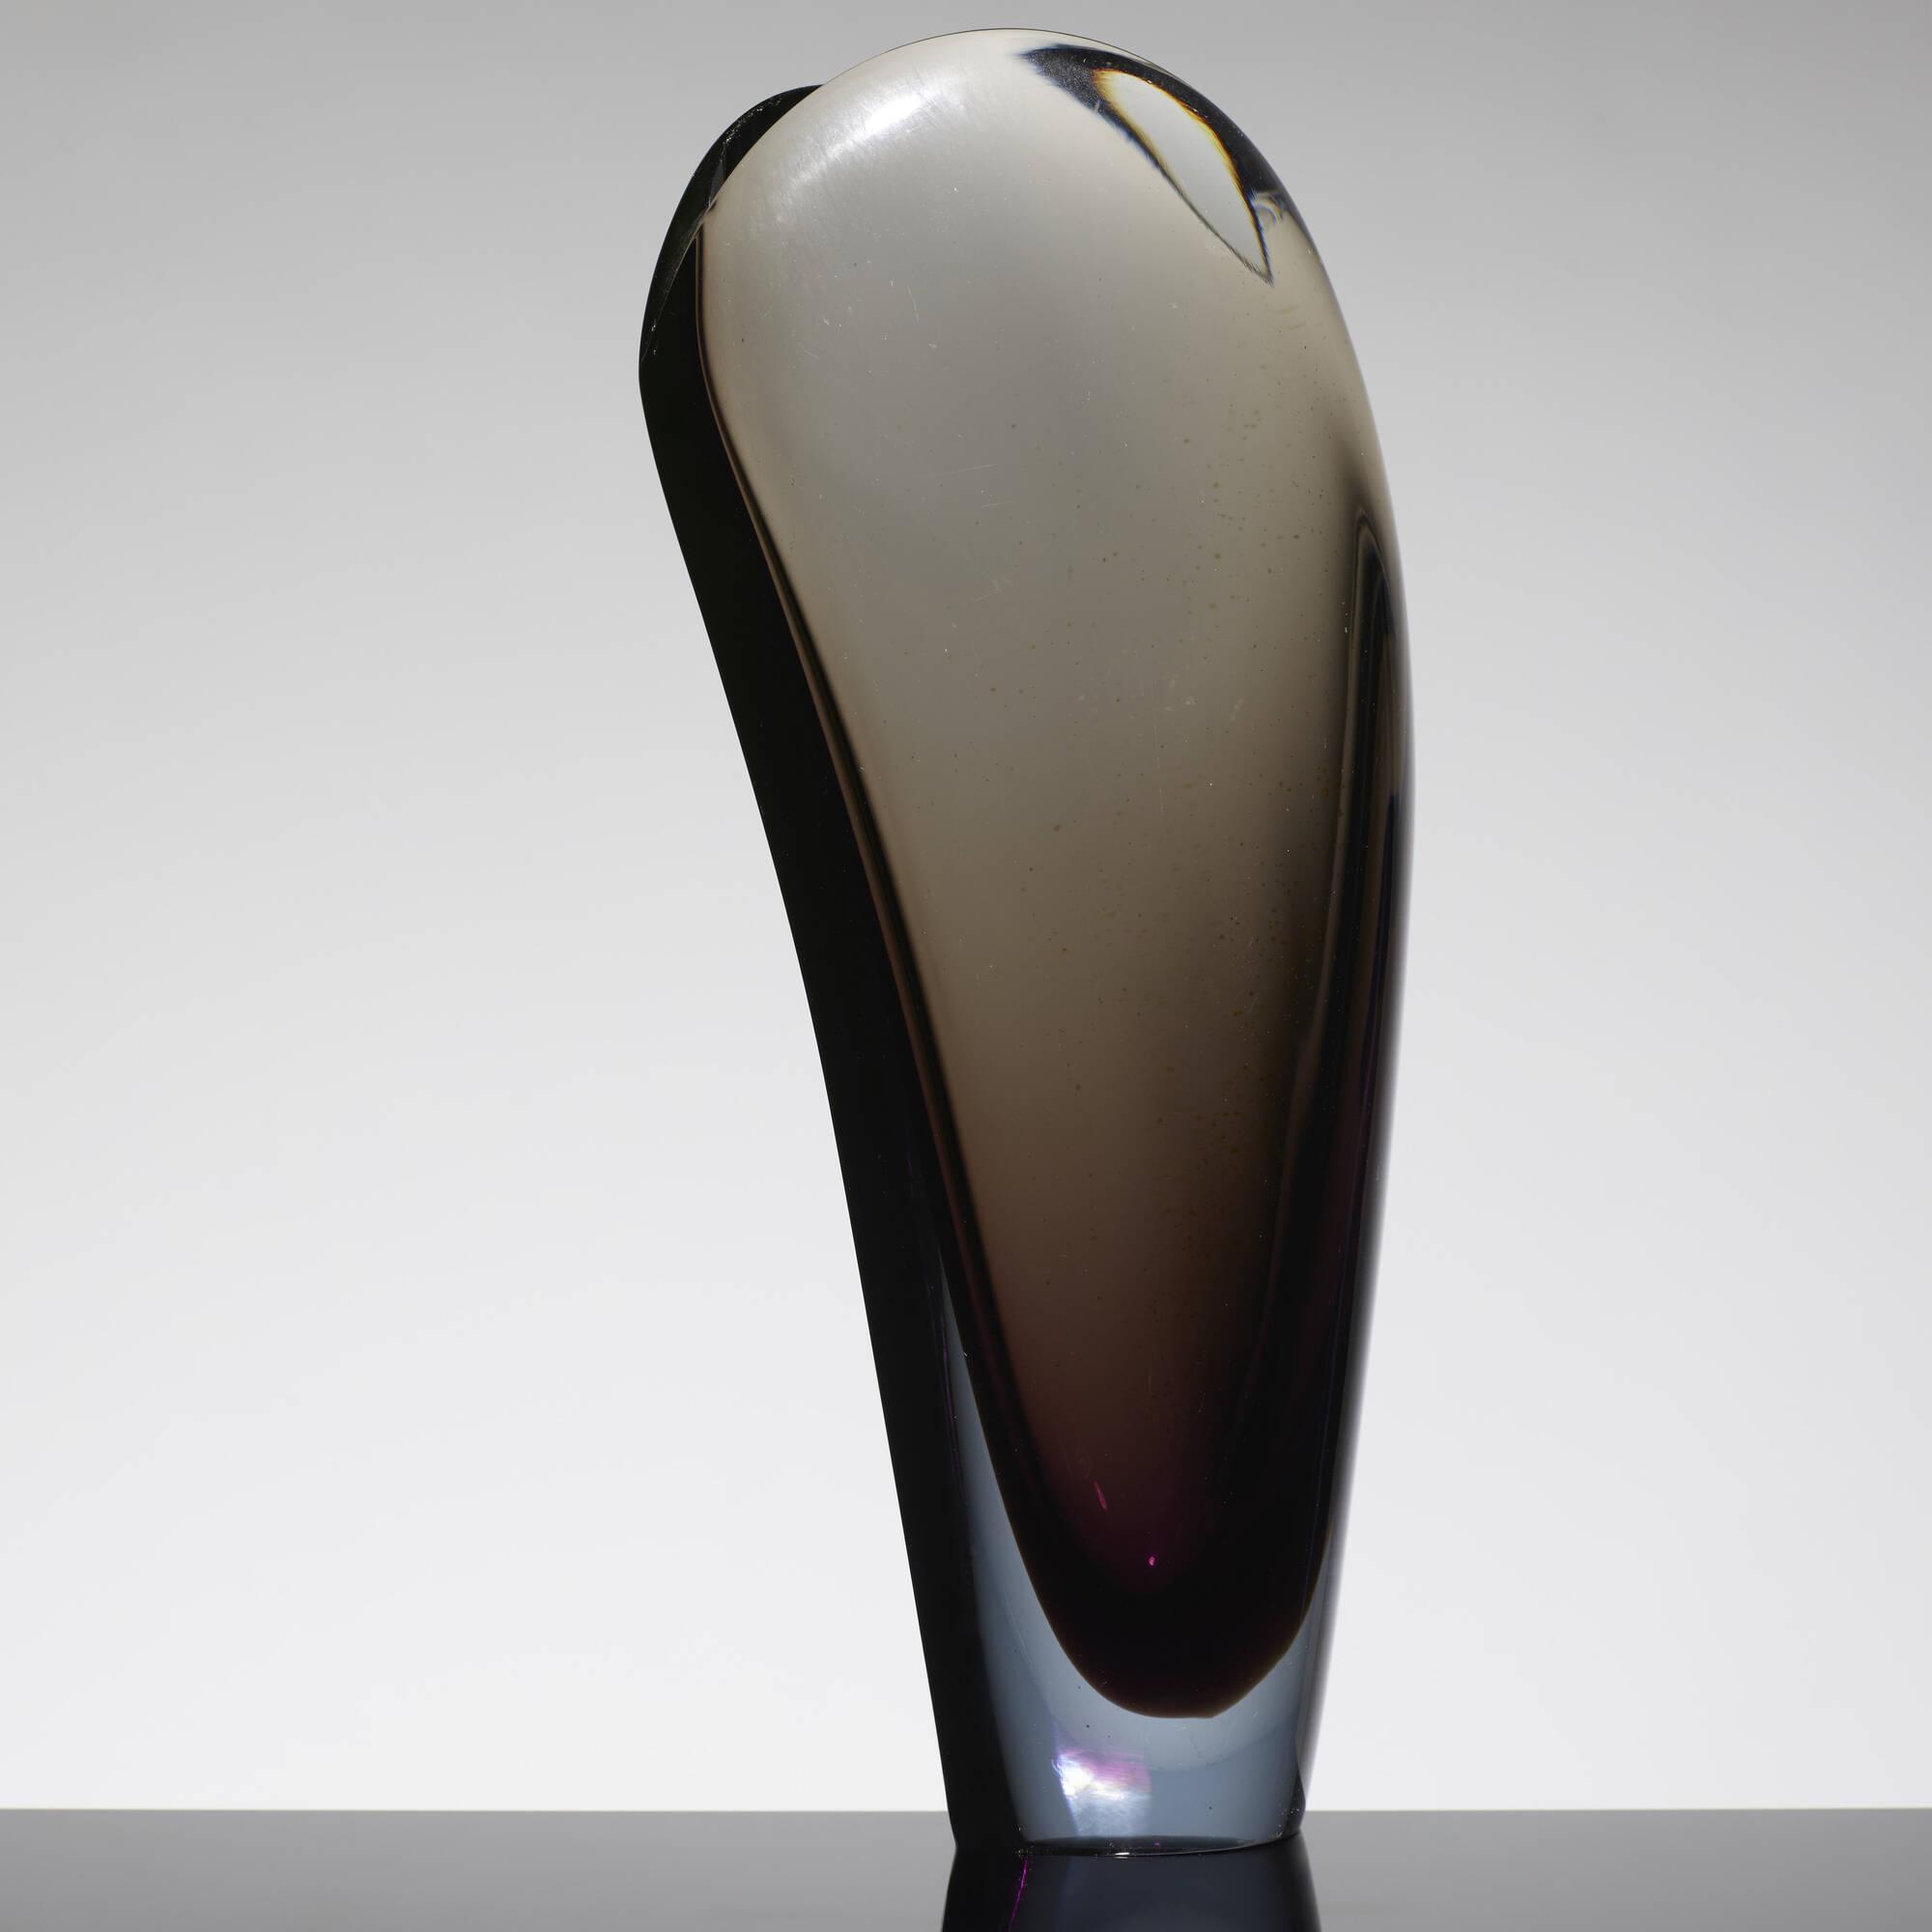 165: Flavio Poli / Valva vase, model 11485 (2 of 2)